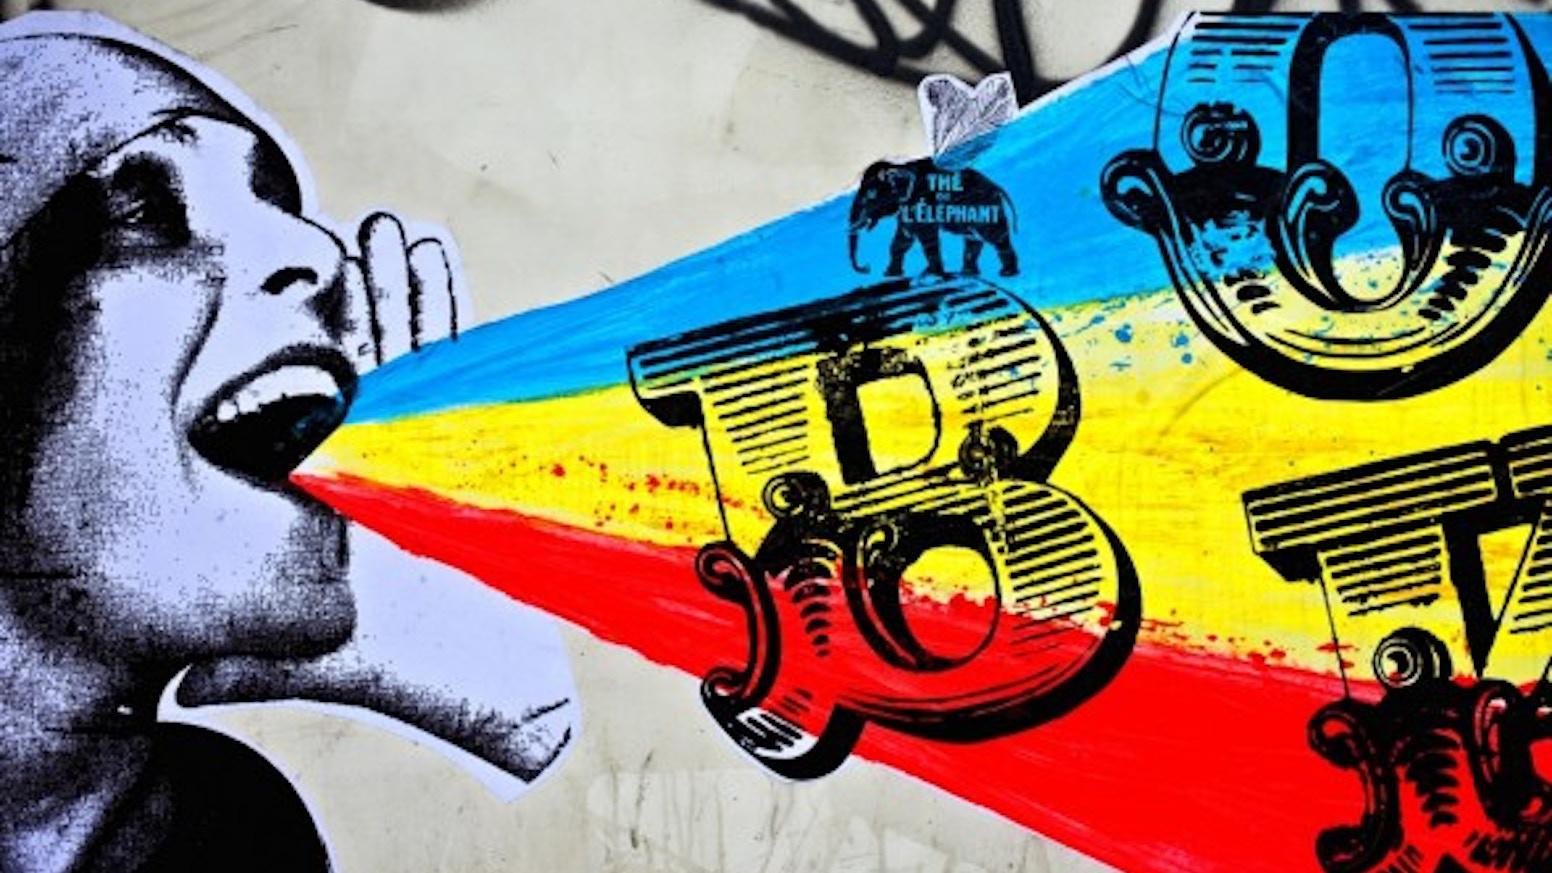 AEROSOuL CARIOCA: A Journey Inside Rio's Graffiti Culture